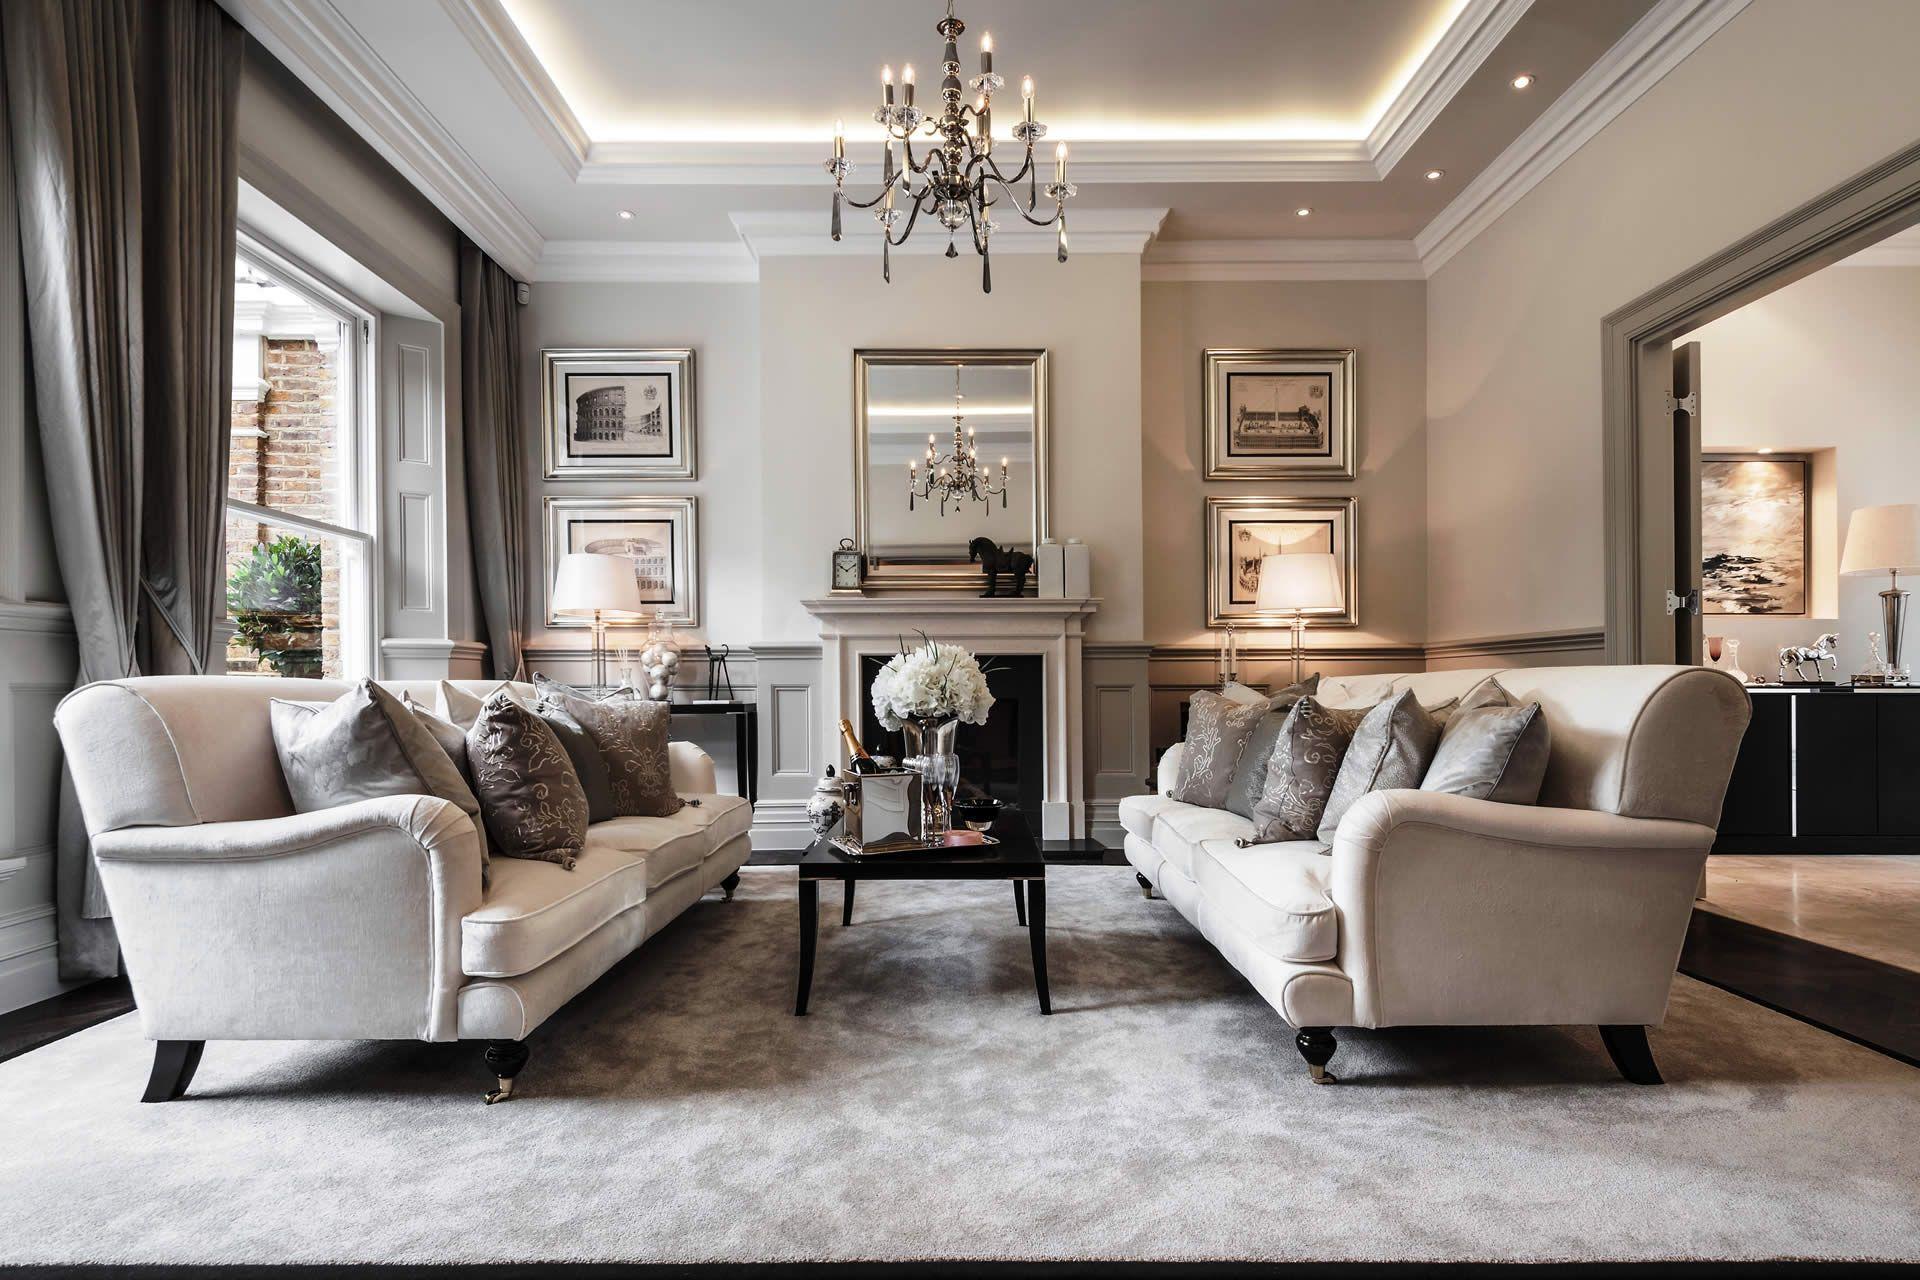 Alexander james interiors interior design show houses also grey is rh ar pinterest